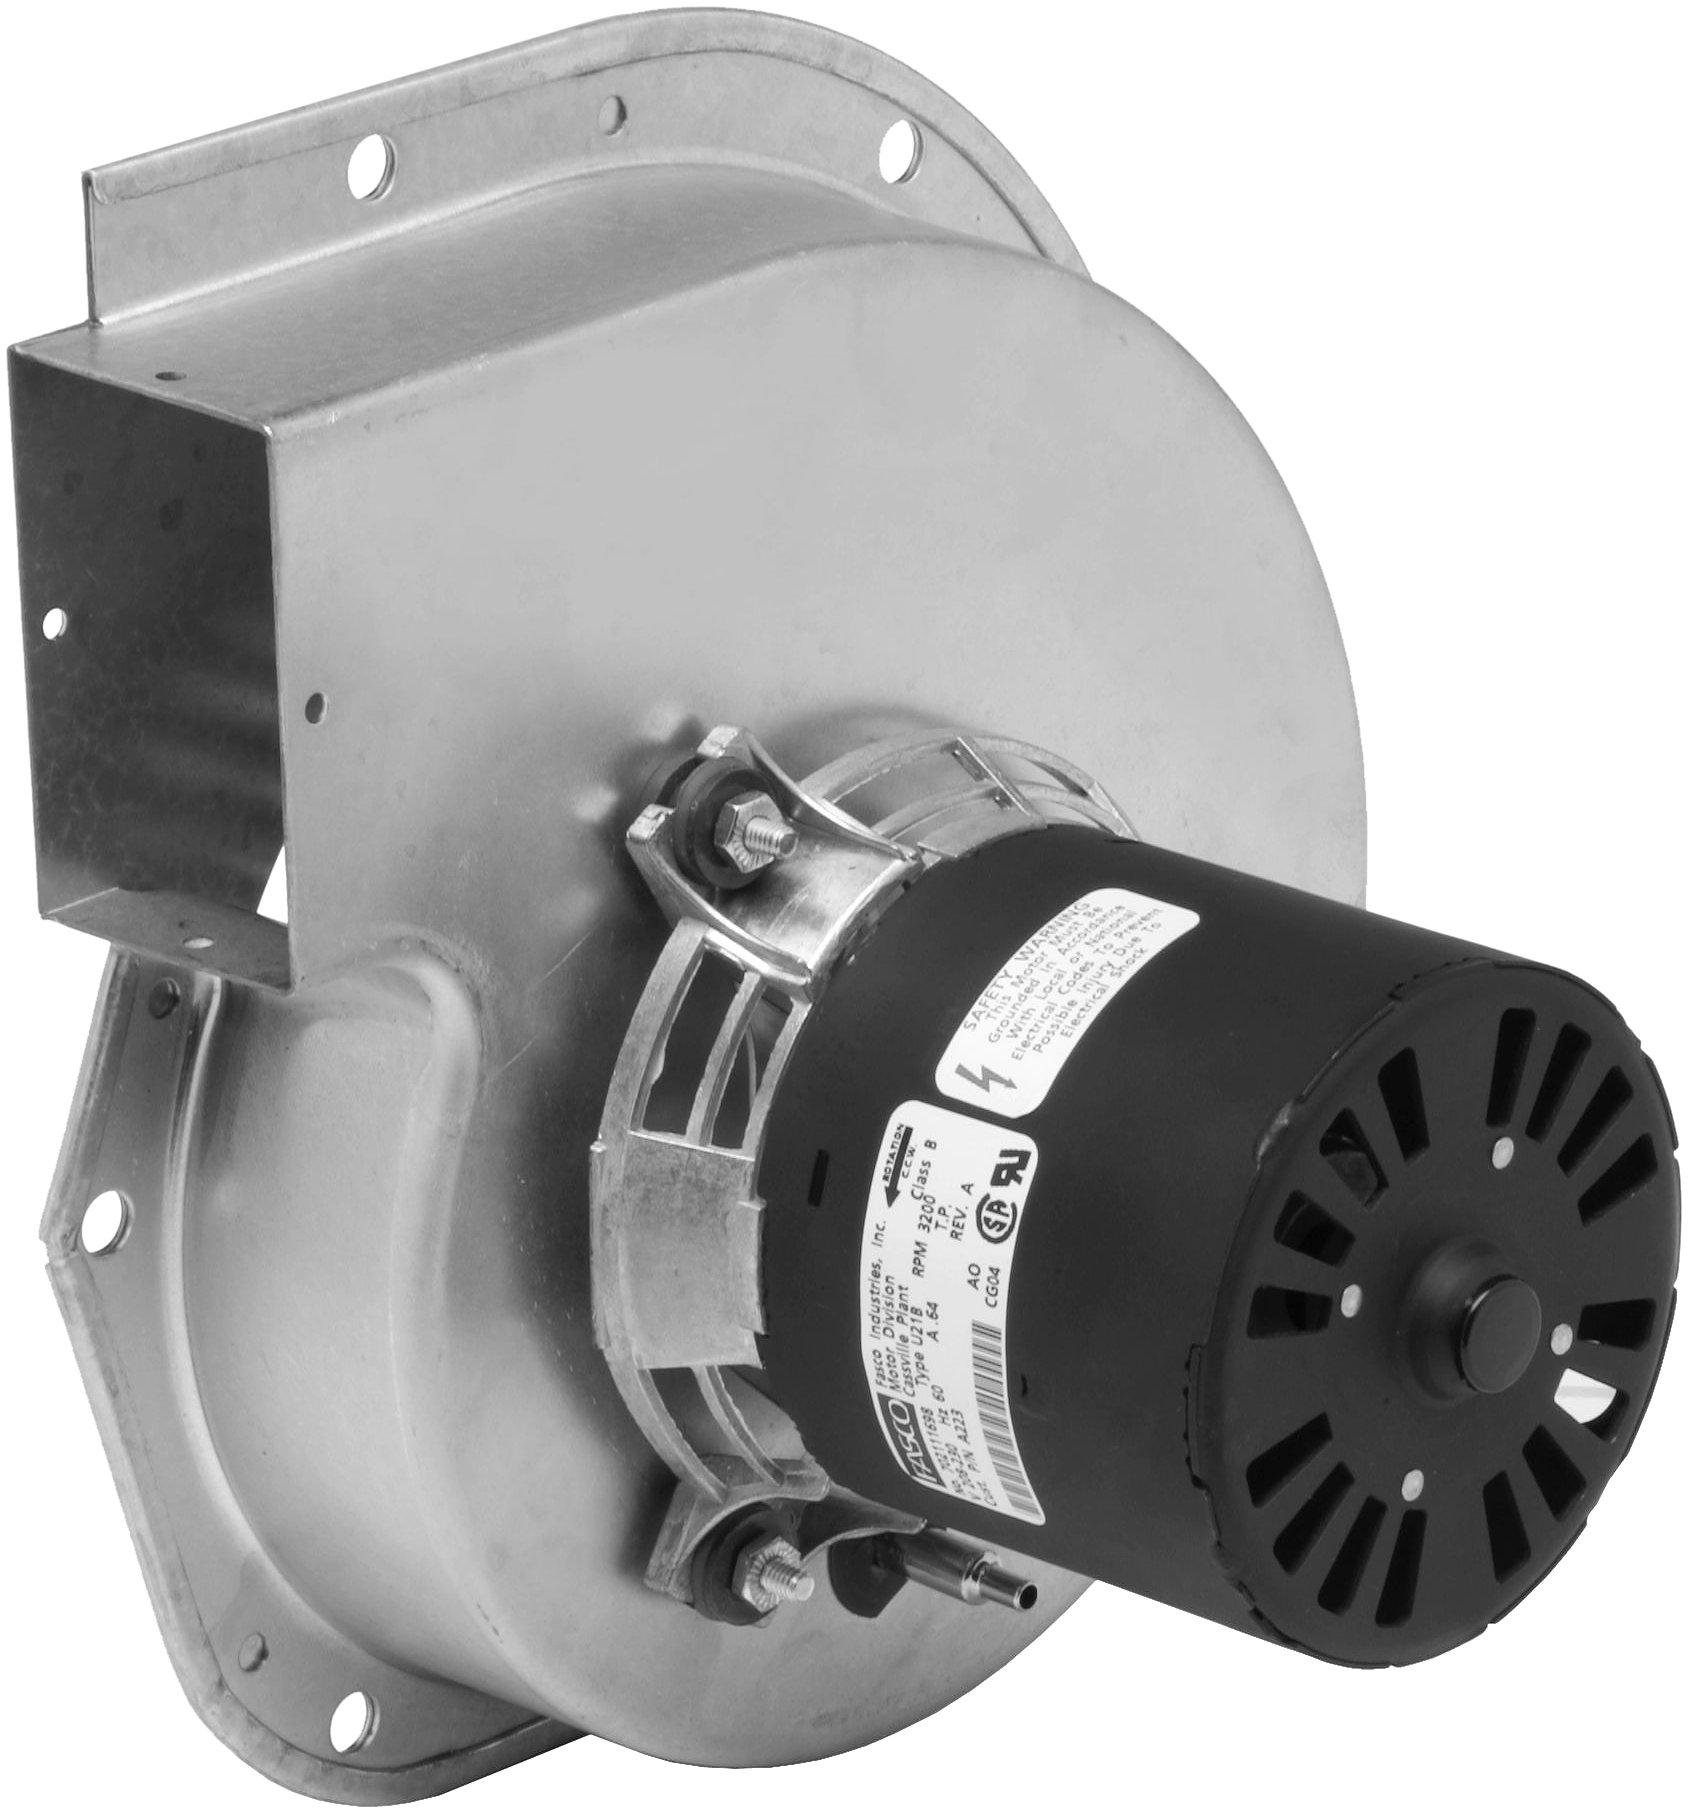 Fasco A223 Specific Purpose Blowers, York 7021-10096, 026-33999-001